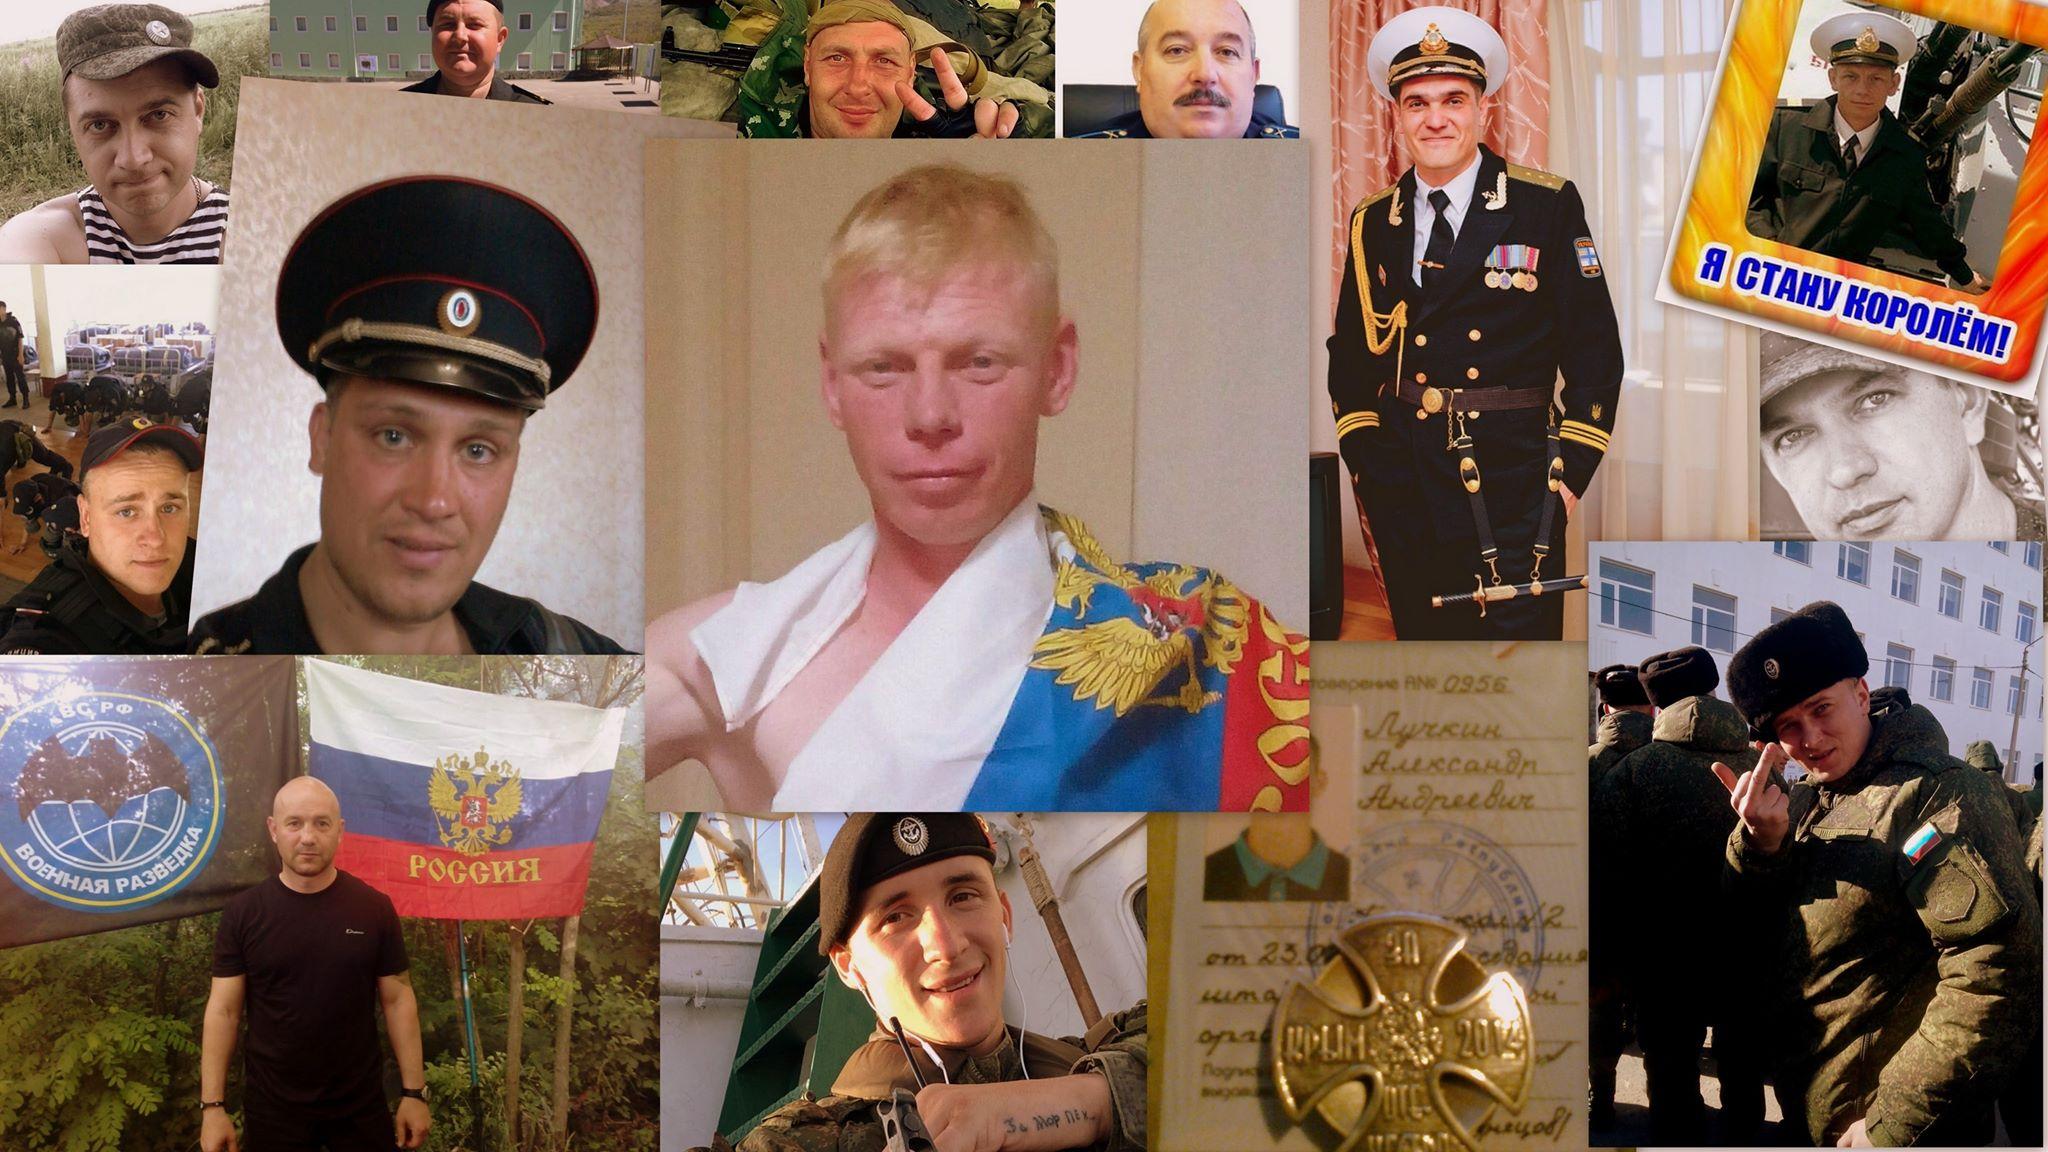 Кримські зрадники – Крымские предатели – Crimean traitors (14 червня)